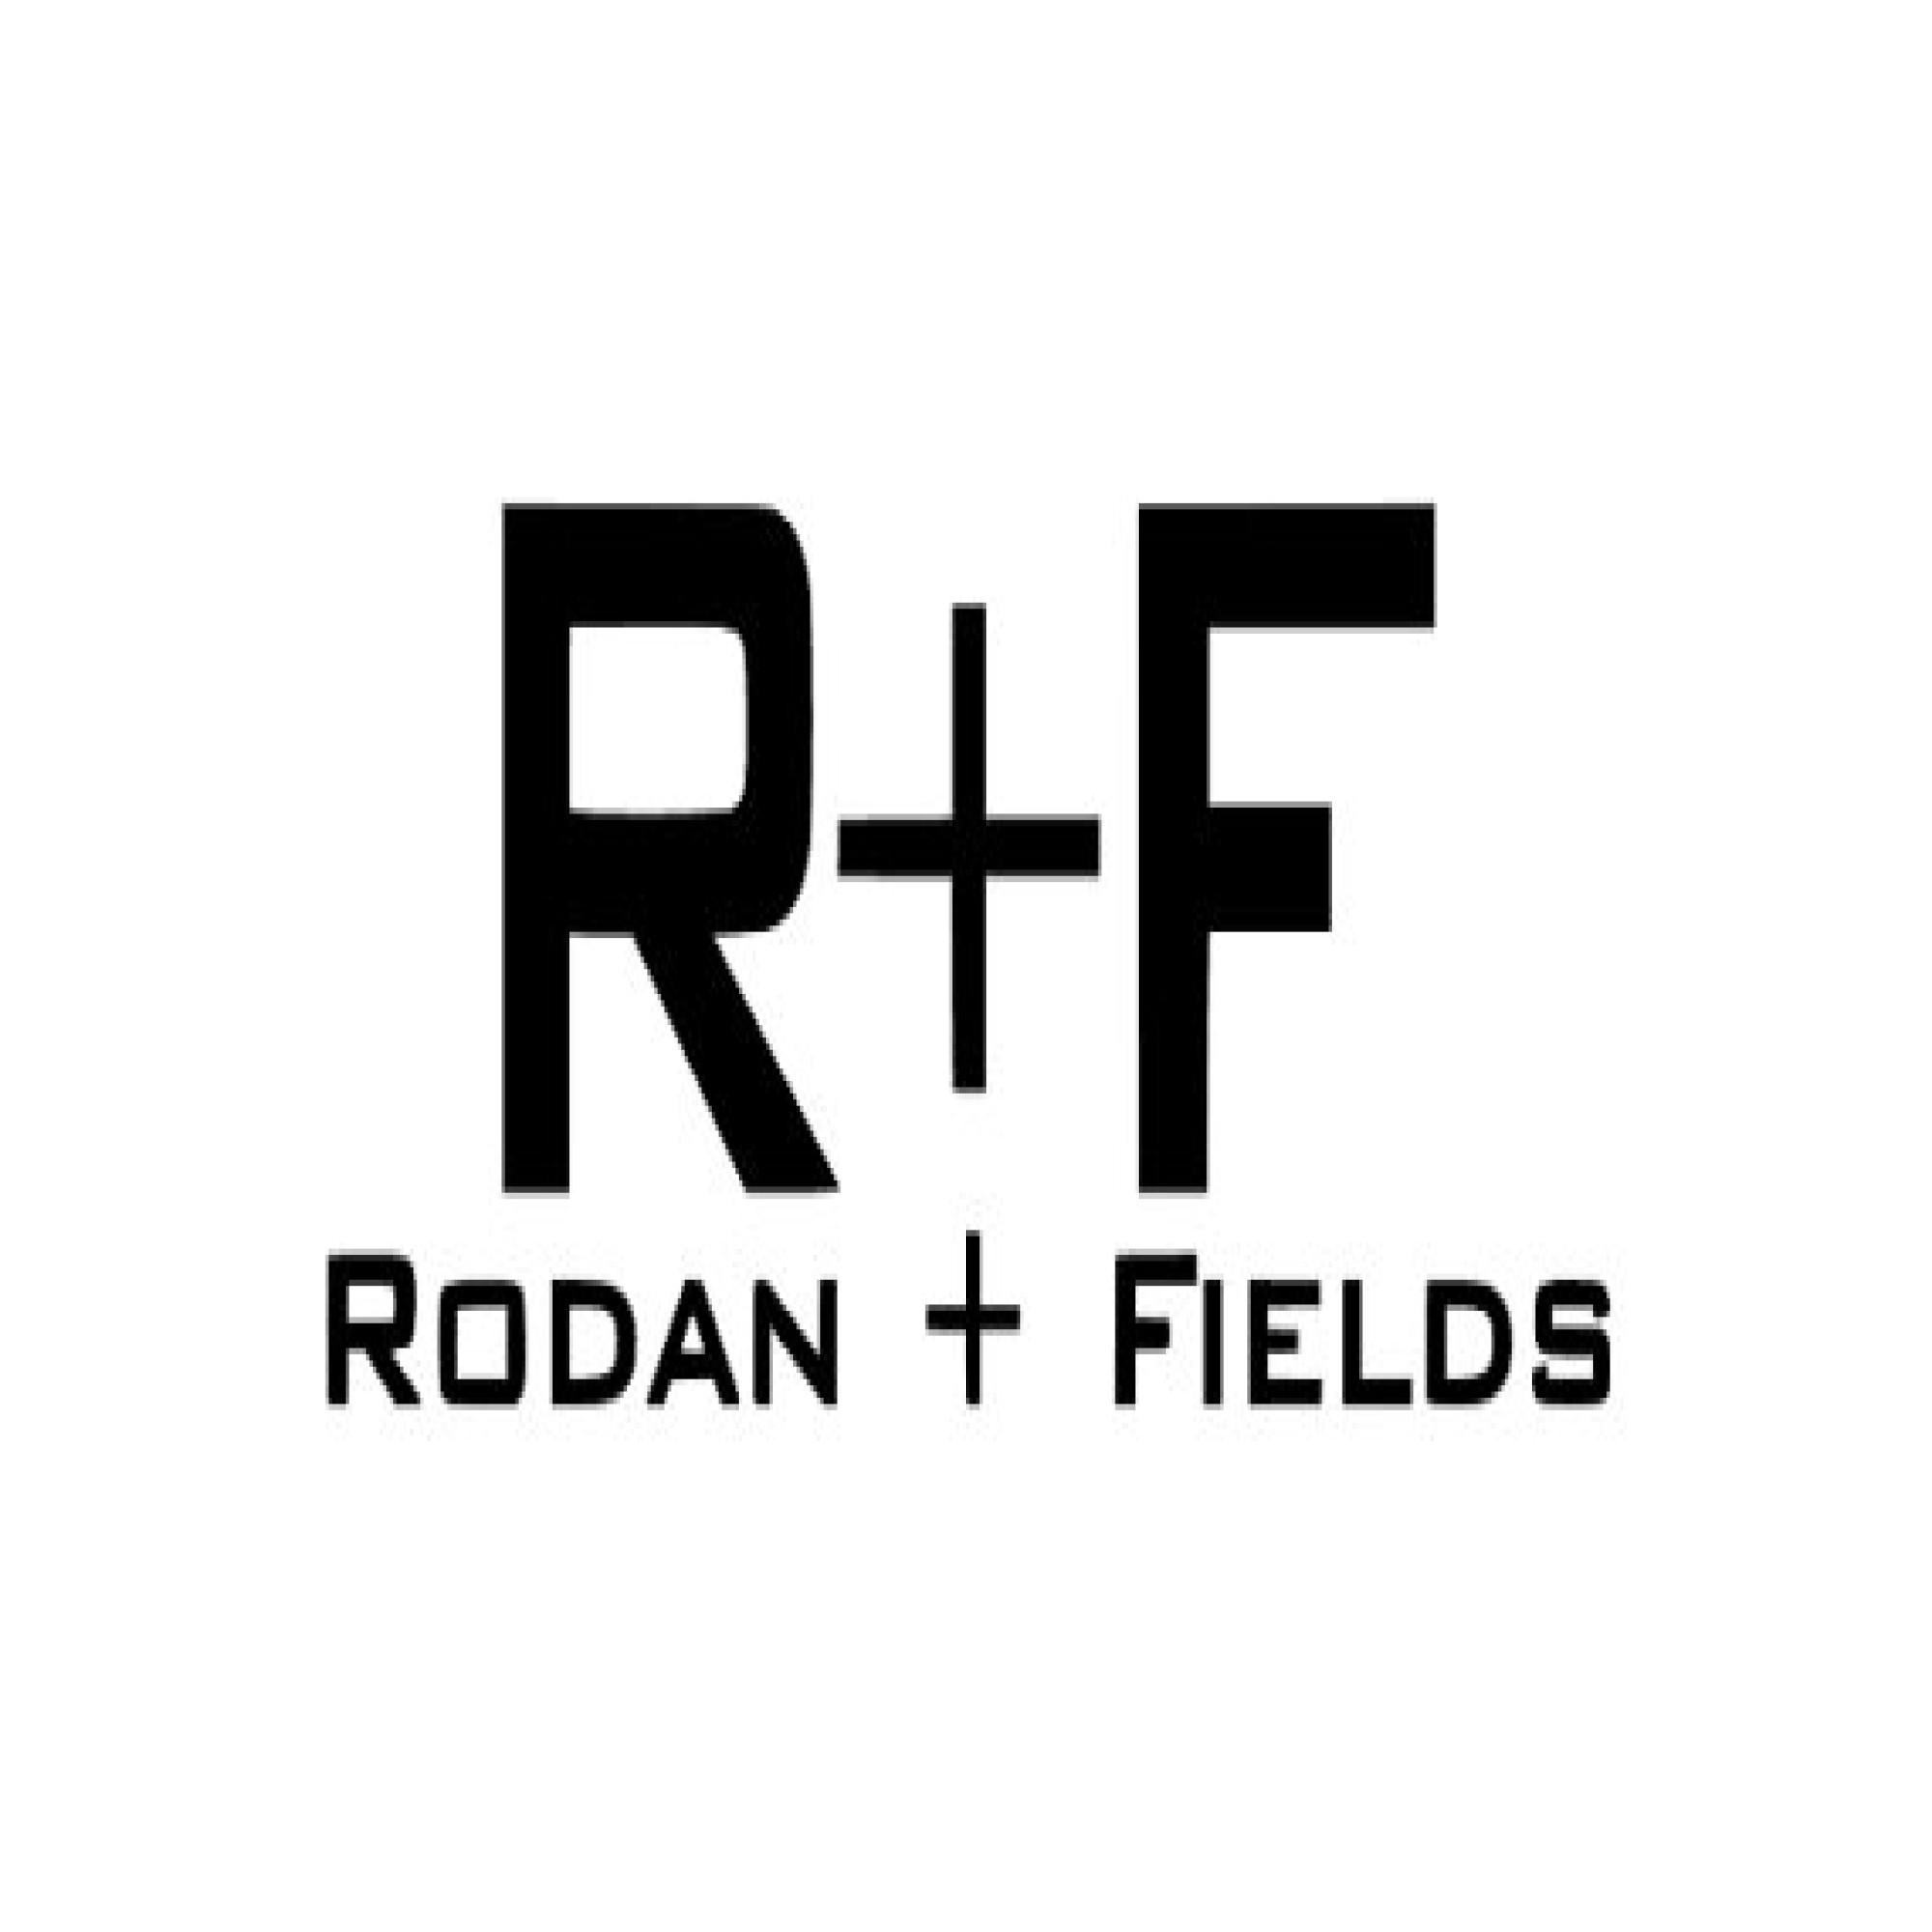 7c31e51c74d5dc794541d4caf0b39e75_rodan-and-fields-car-decal-rodan-and-fields-clipart_570-311